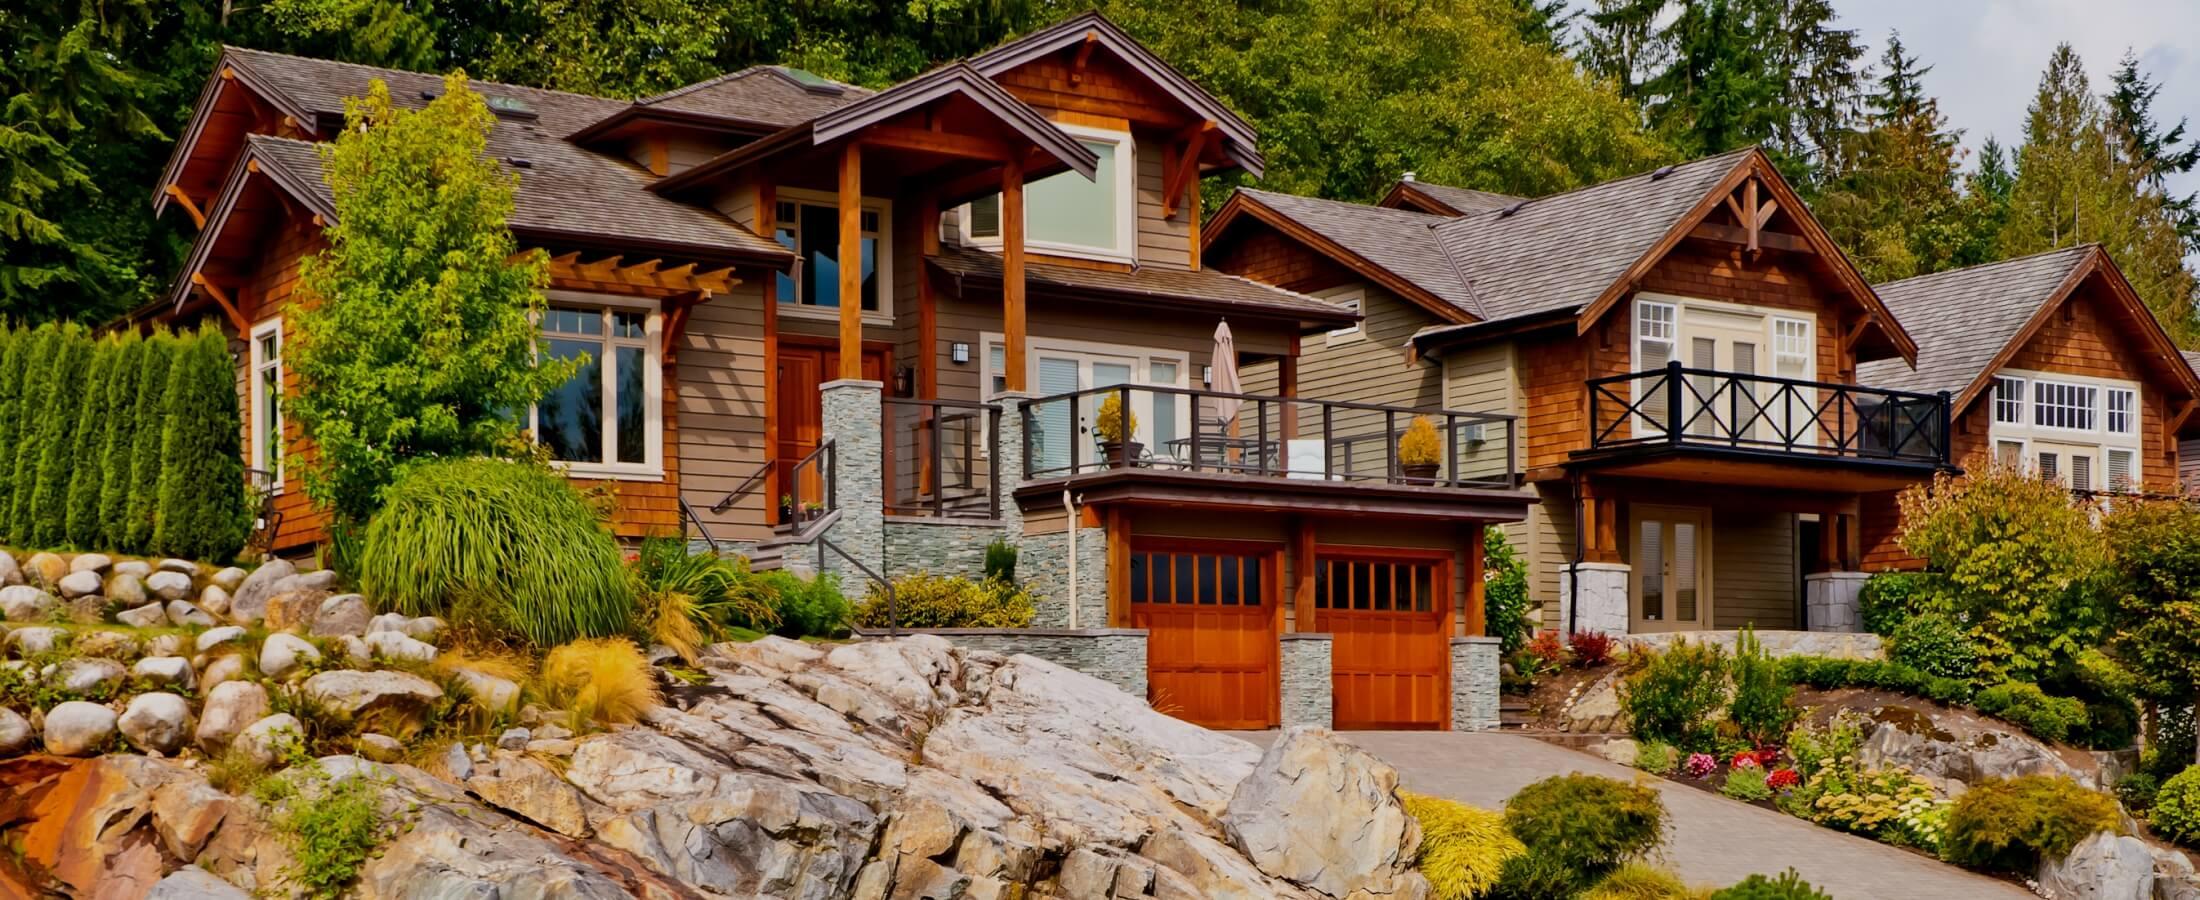 Northern Idaho Real Estate | Eastern Washington Real Estate